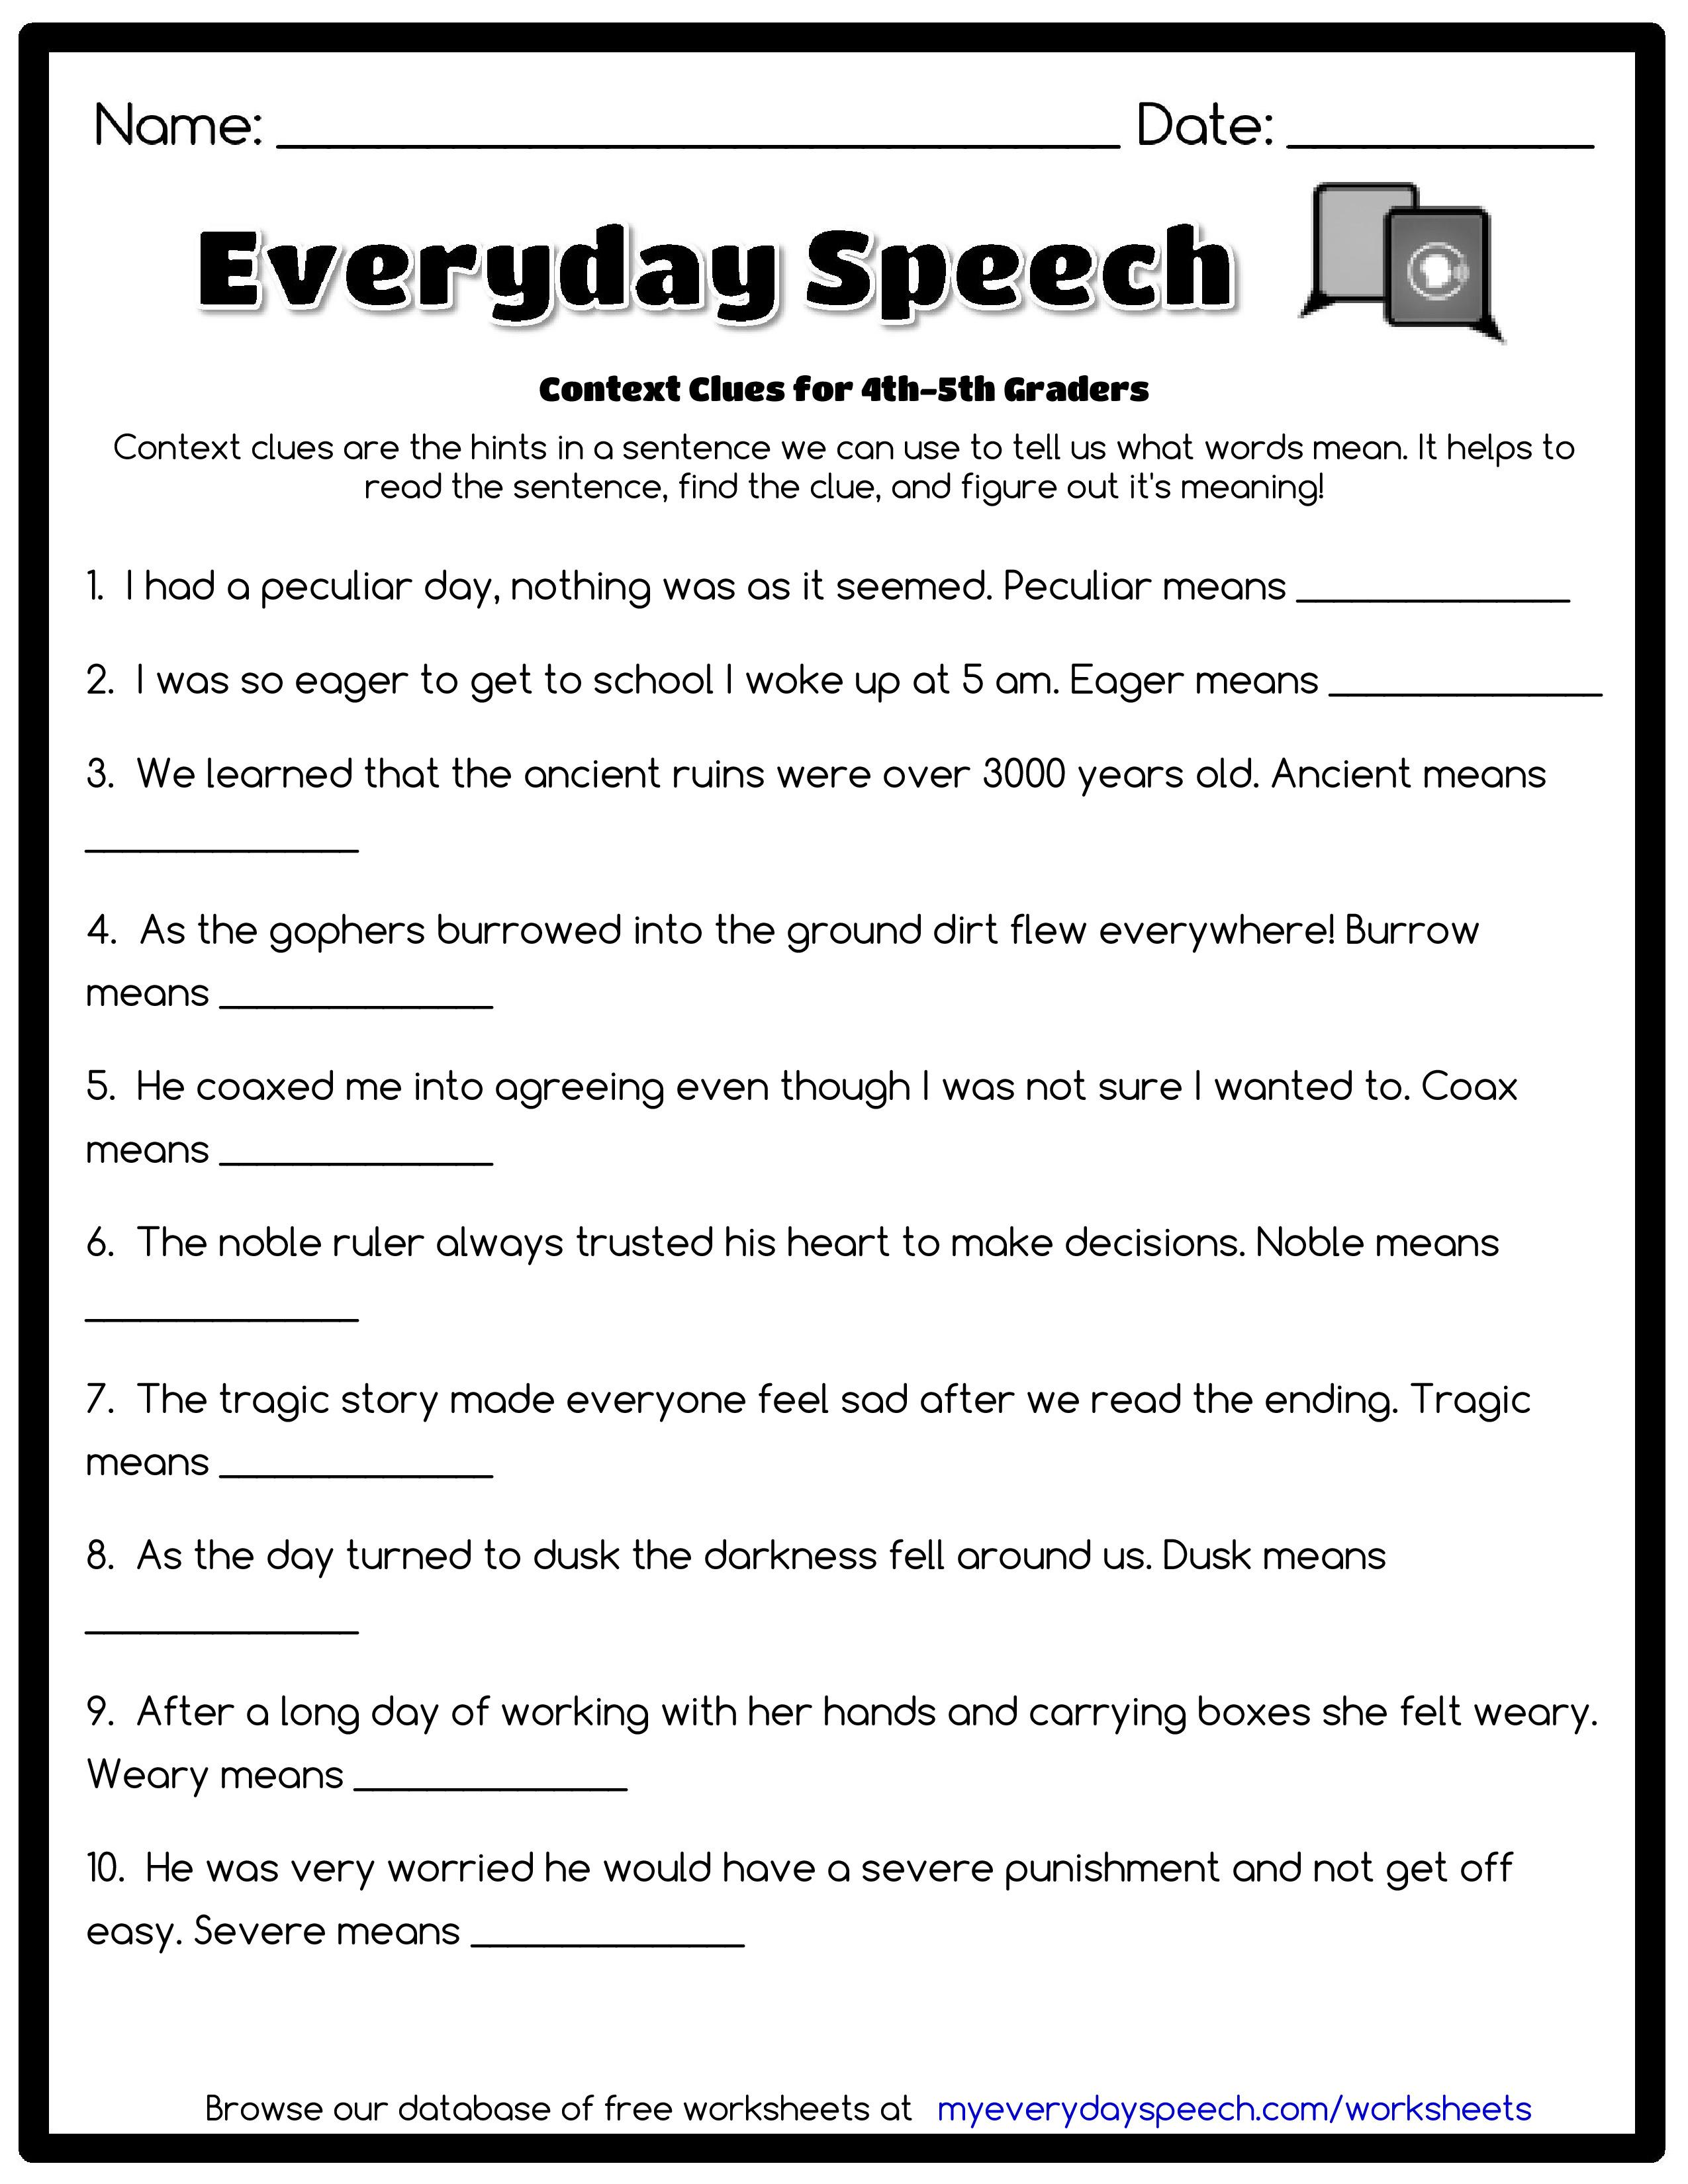 6th Grade Context Clues Worksheet